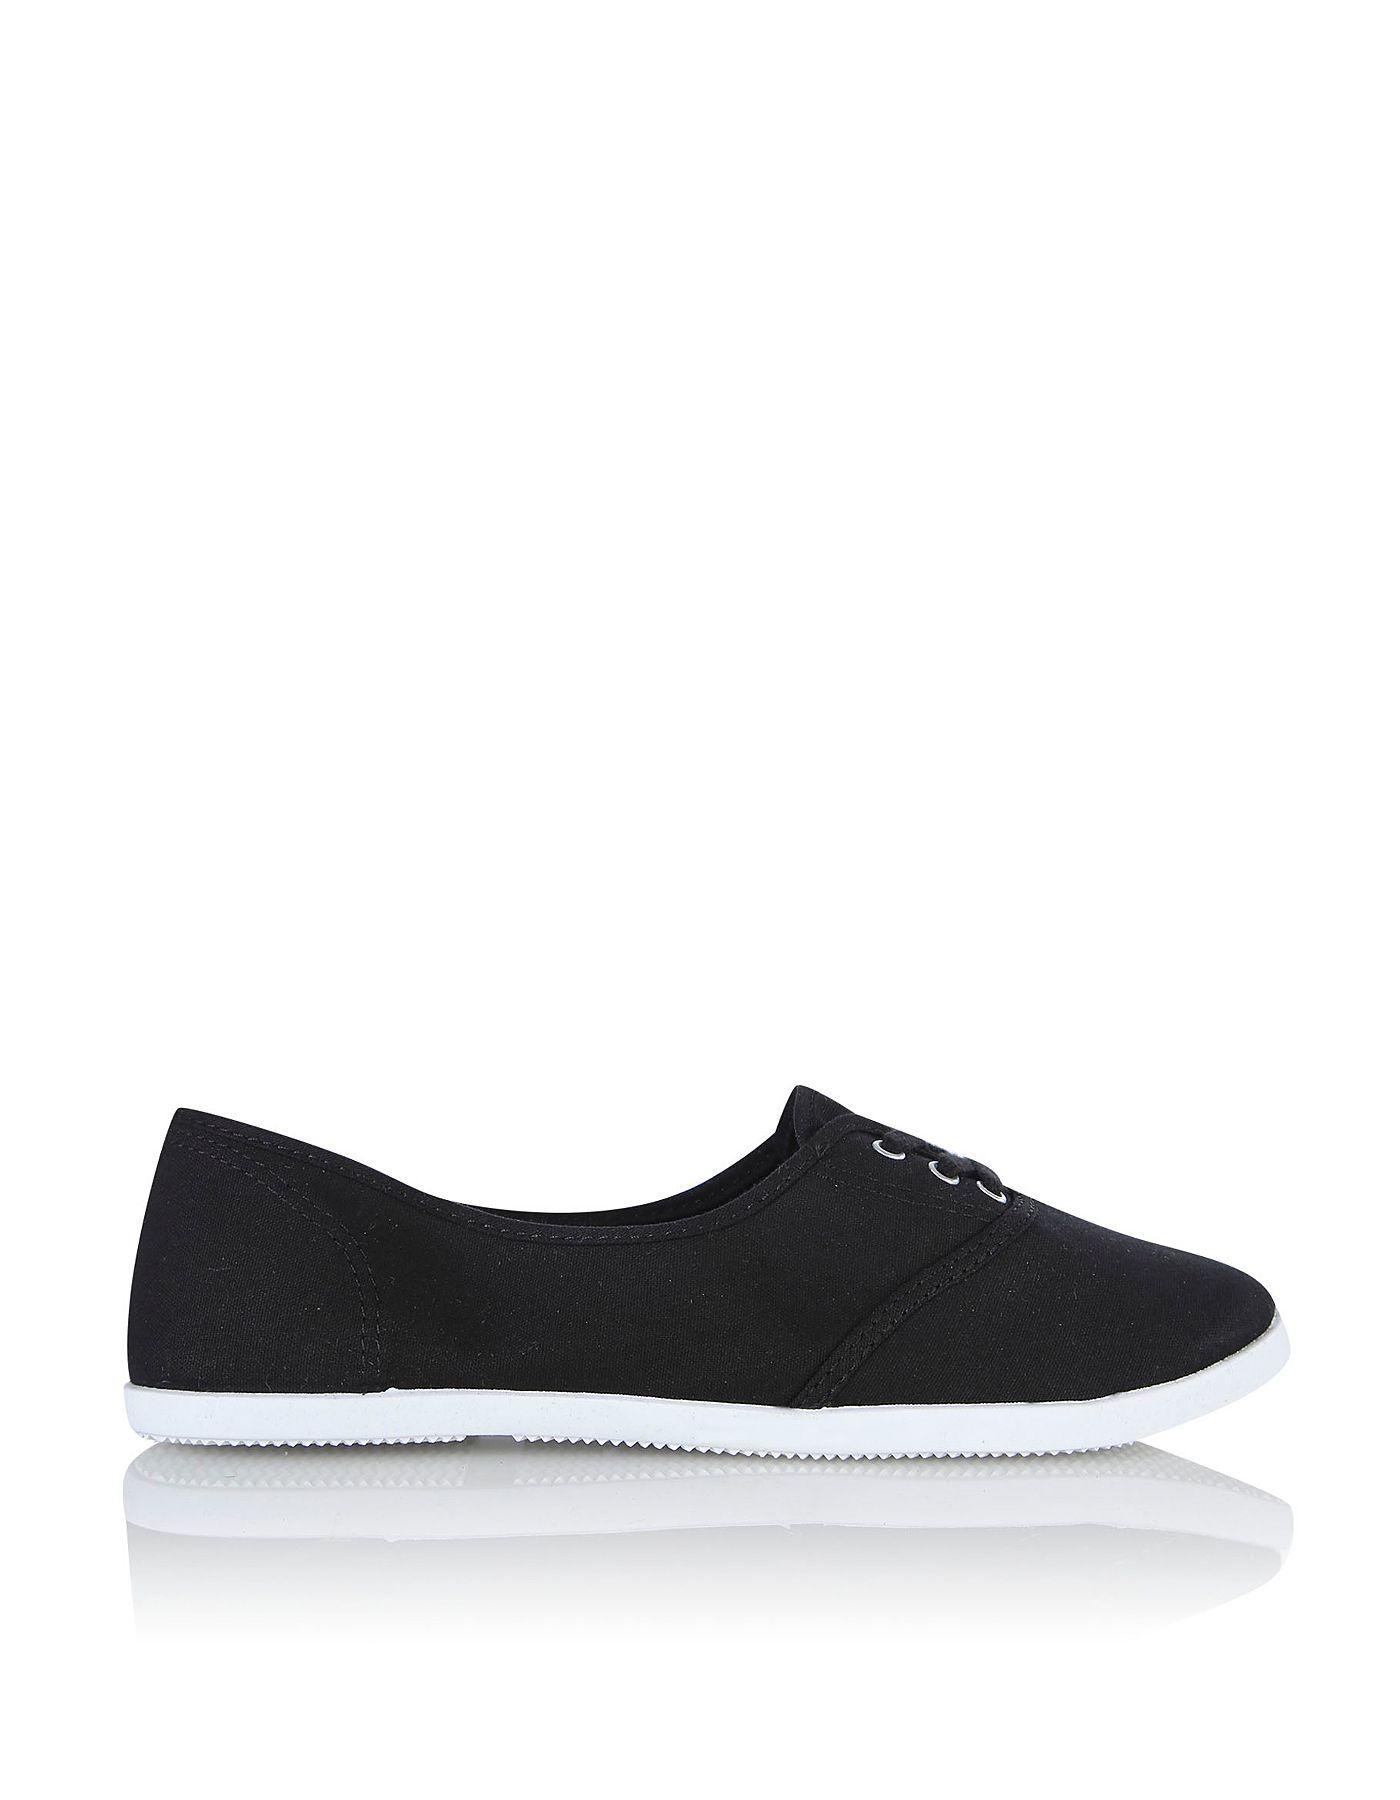 ASDA | Trainers women, Shoe boots, Slip